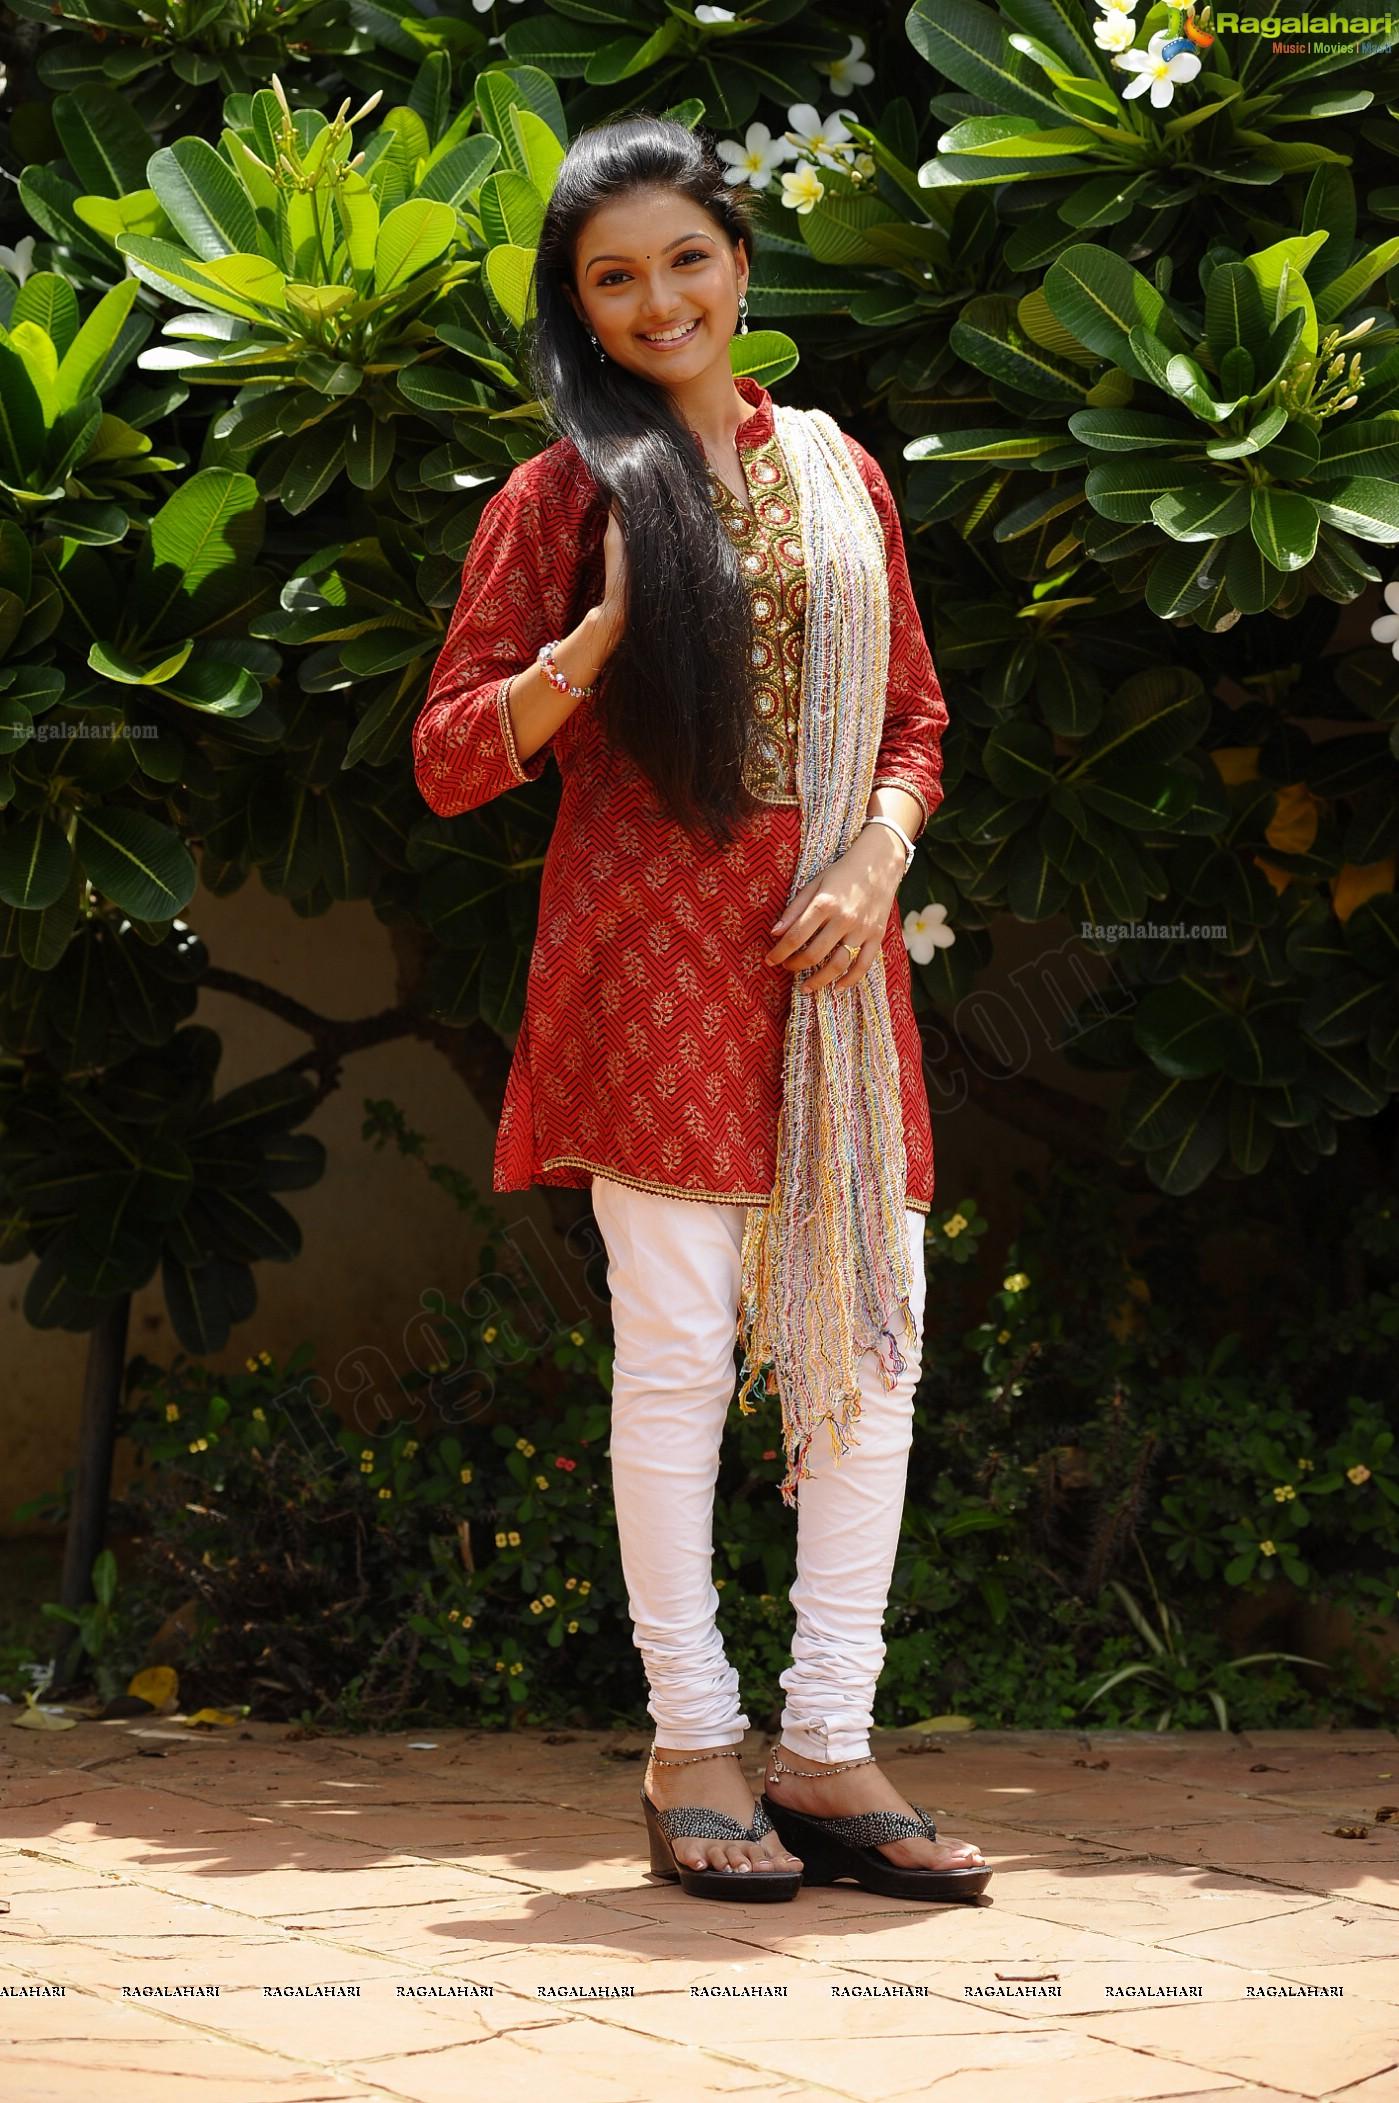 Kajal agarwal indian actress - XVIDEOSCOM